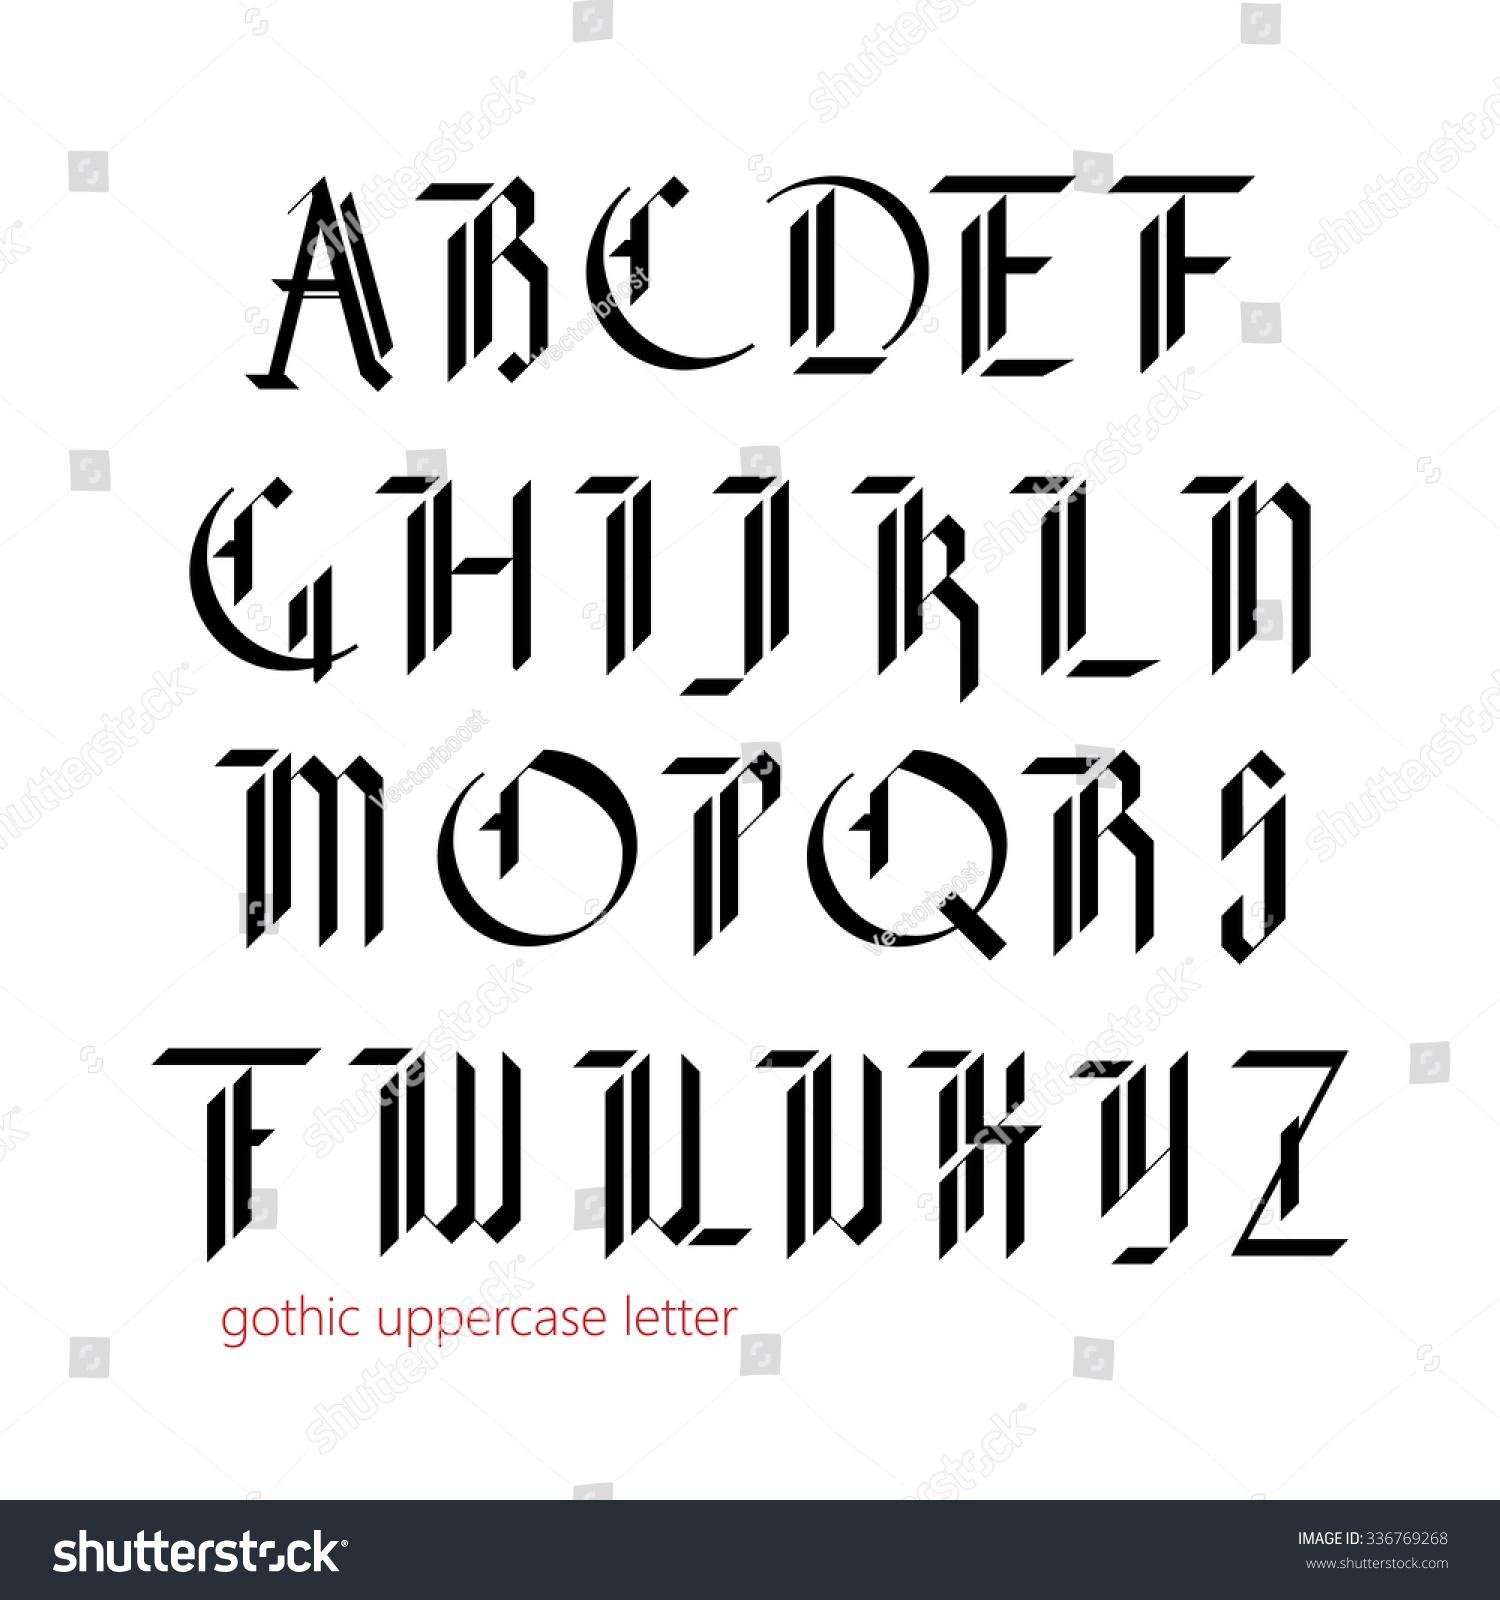 Blackletter Modern Gothic Font All Uppercase Letters